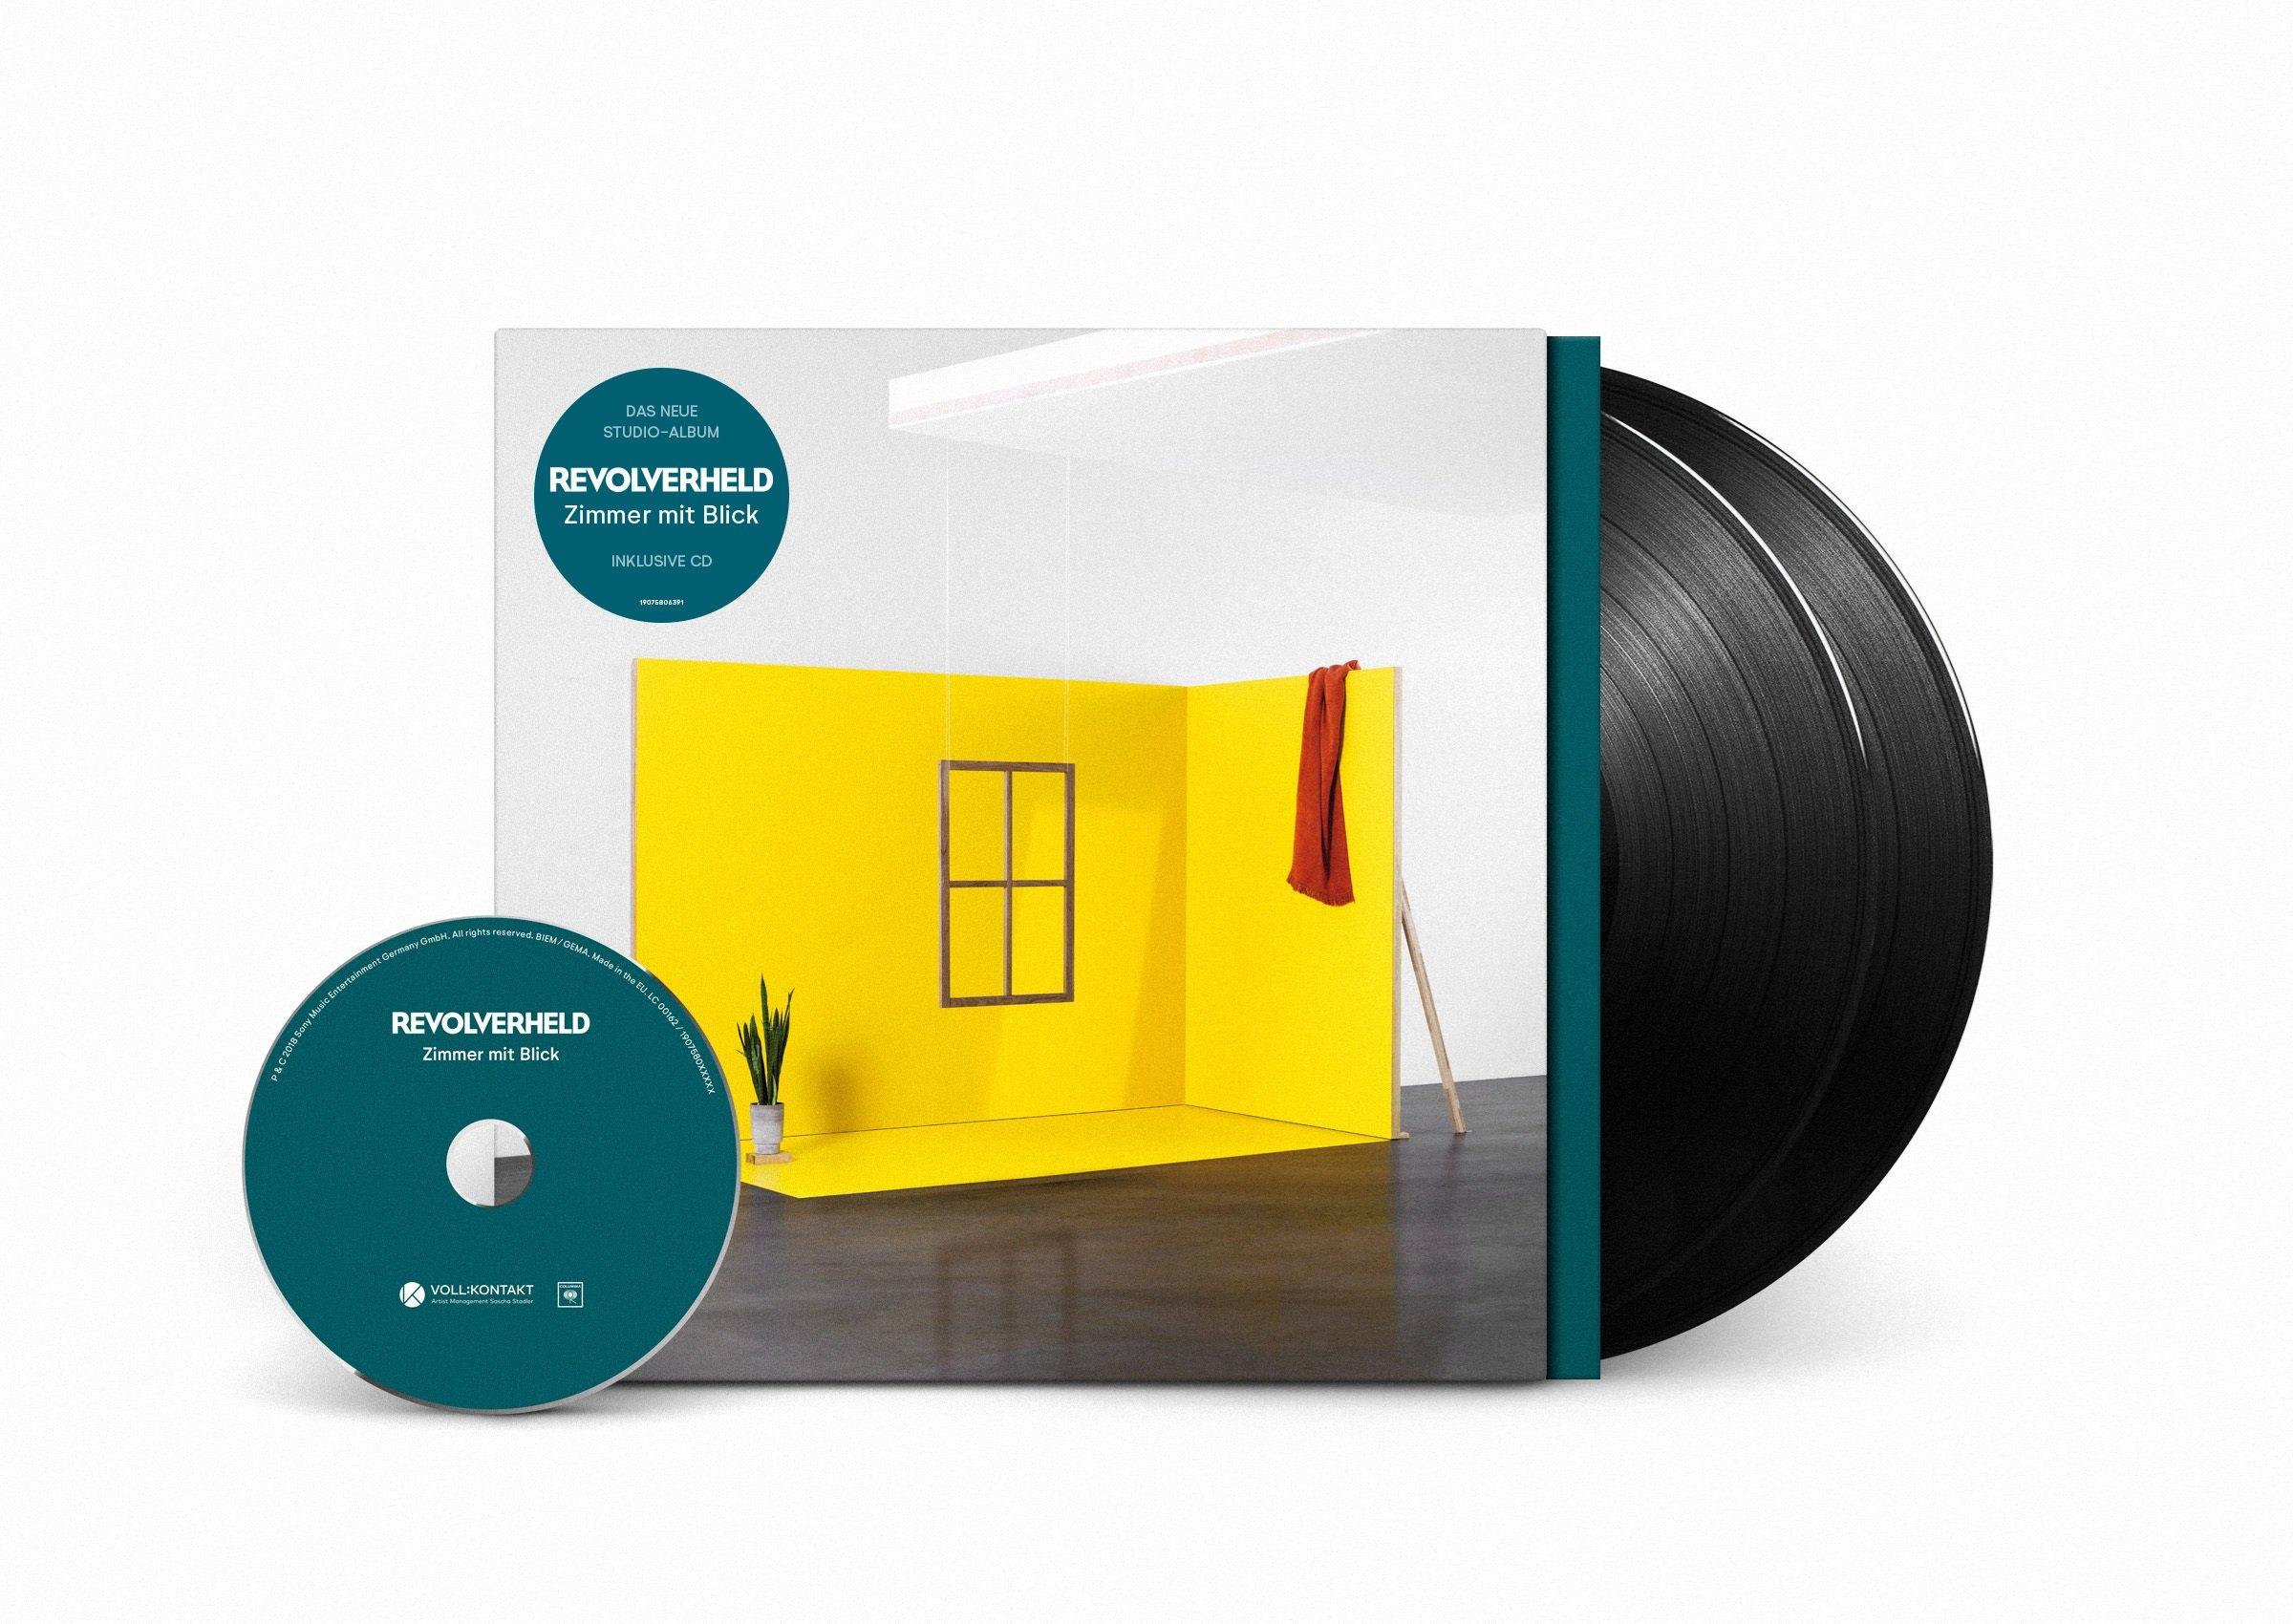 Vinilo : Revolverheld - Zimmer Mit Blick (With CD, Germany - Import, 3PC)